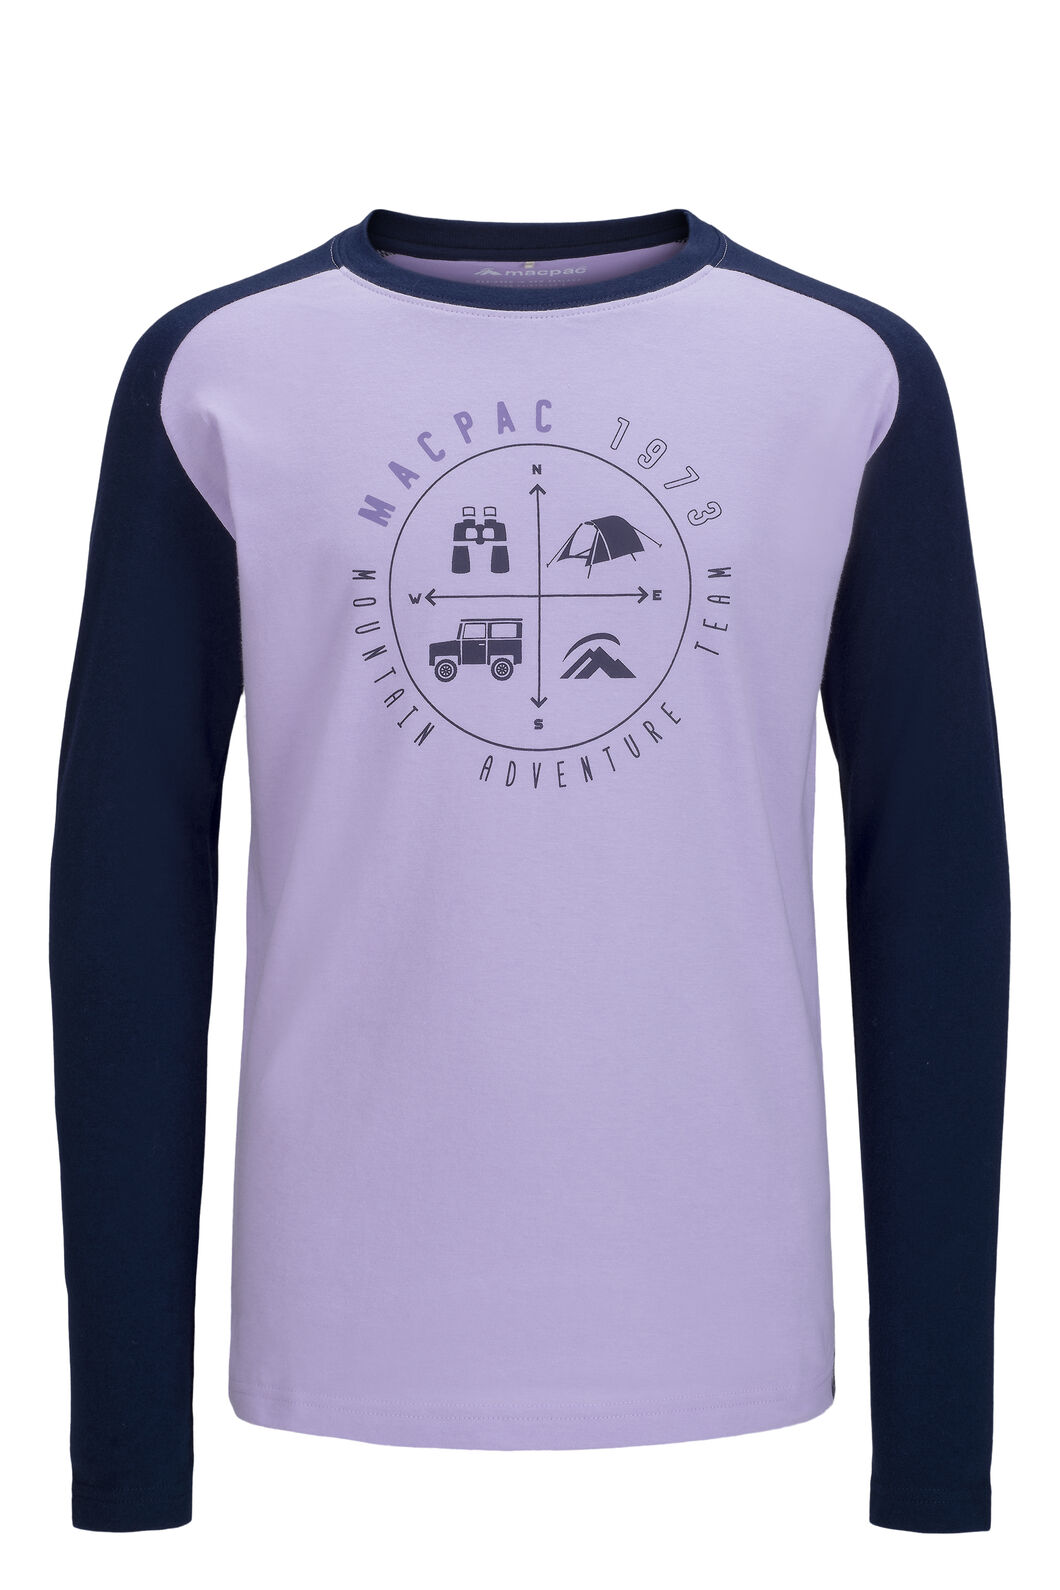 Macpac Kids' Compass Fairtrade Organic Cotton Long Sleeve Tee, Lavender/Black Iris, hi-res